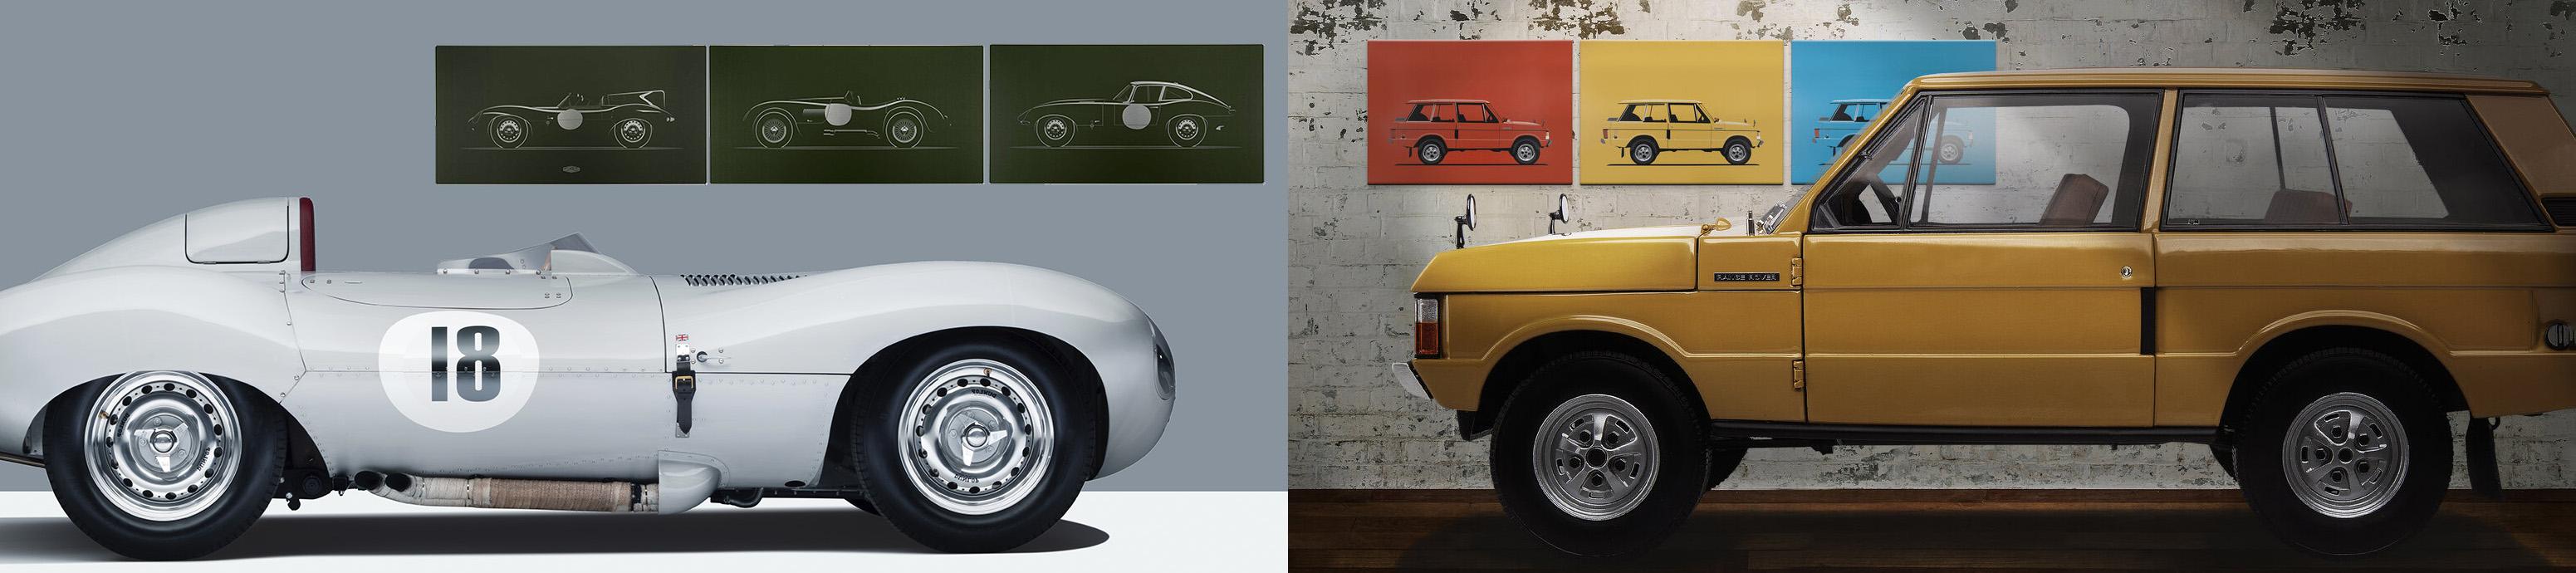 Jaguar Land Rover Artwork & Prints